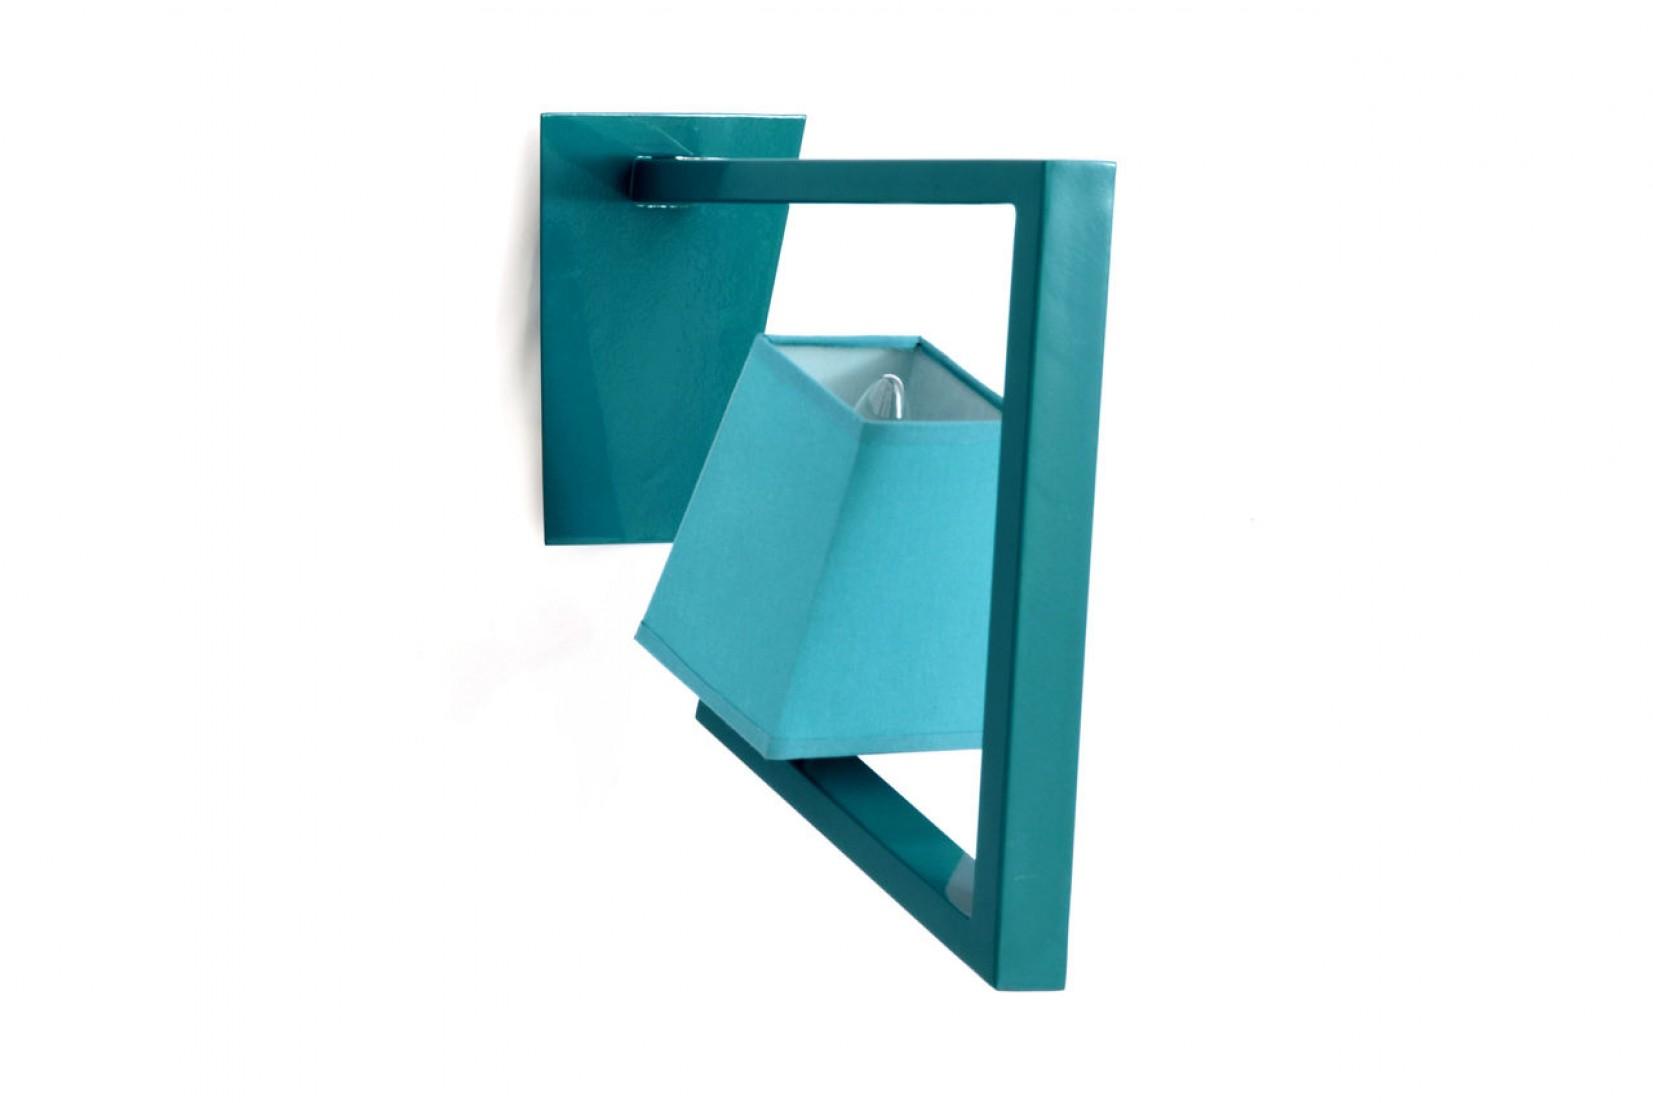 CROSSFADE APL RAL5021 - applique, bleu d'eau